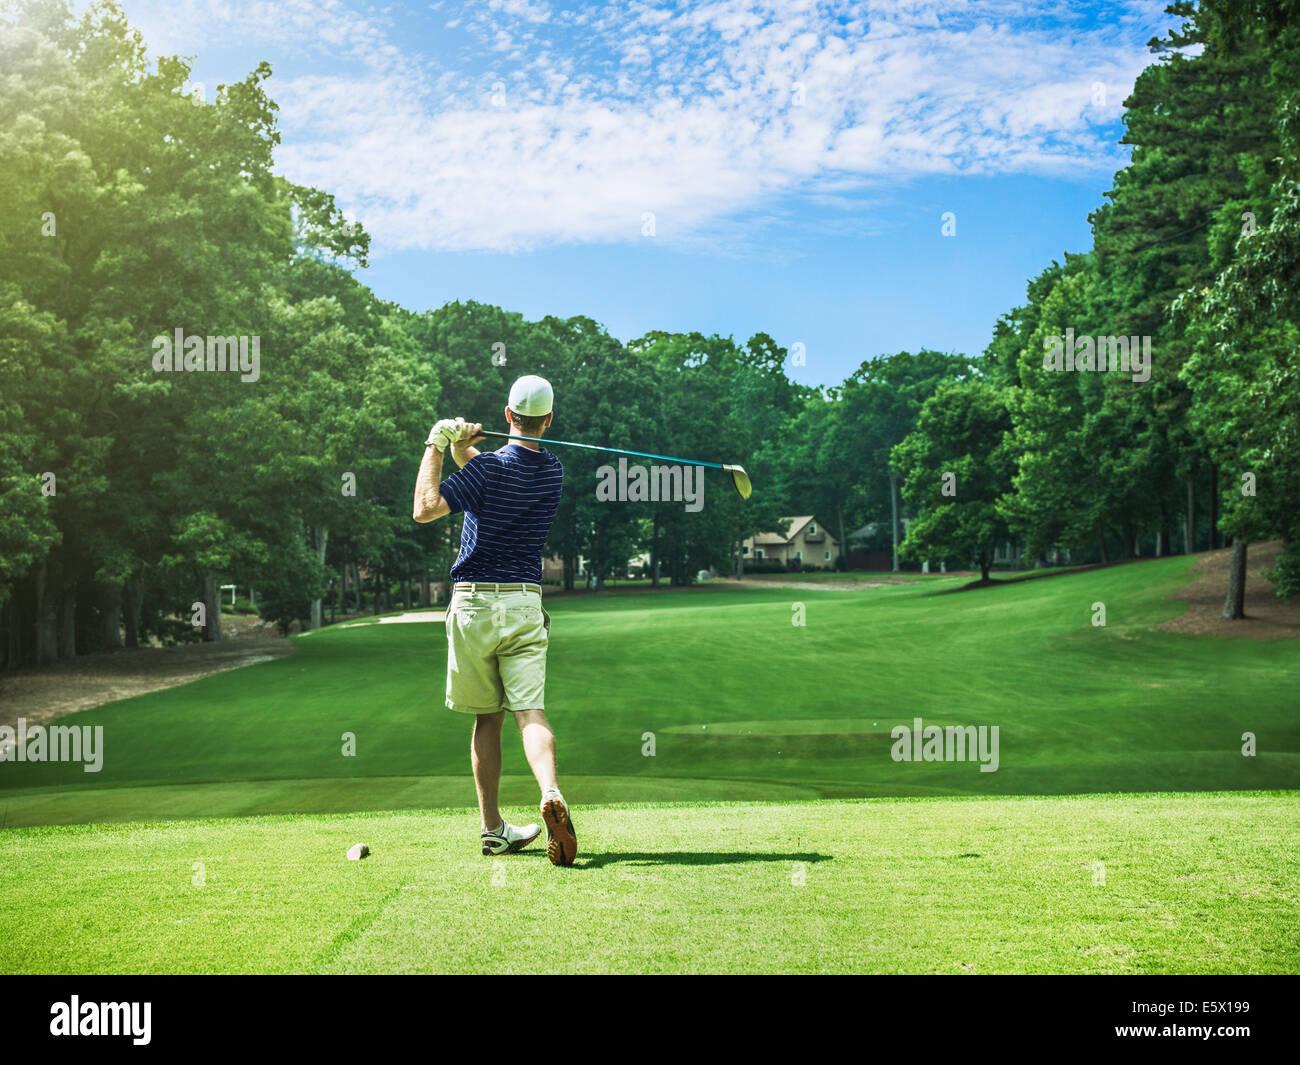 Rückansicht des jungen männlichen Golfer Abschlag am Golfplatz, Apex, North Carolina, USA Stockbild